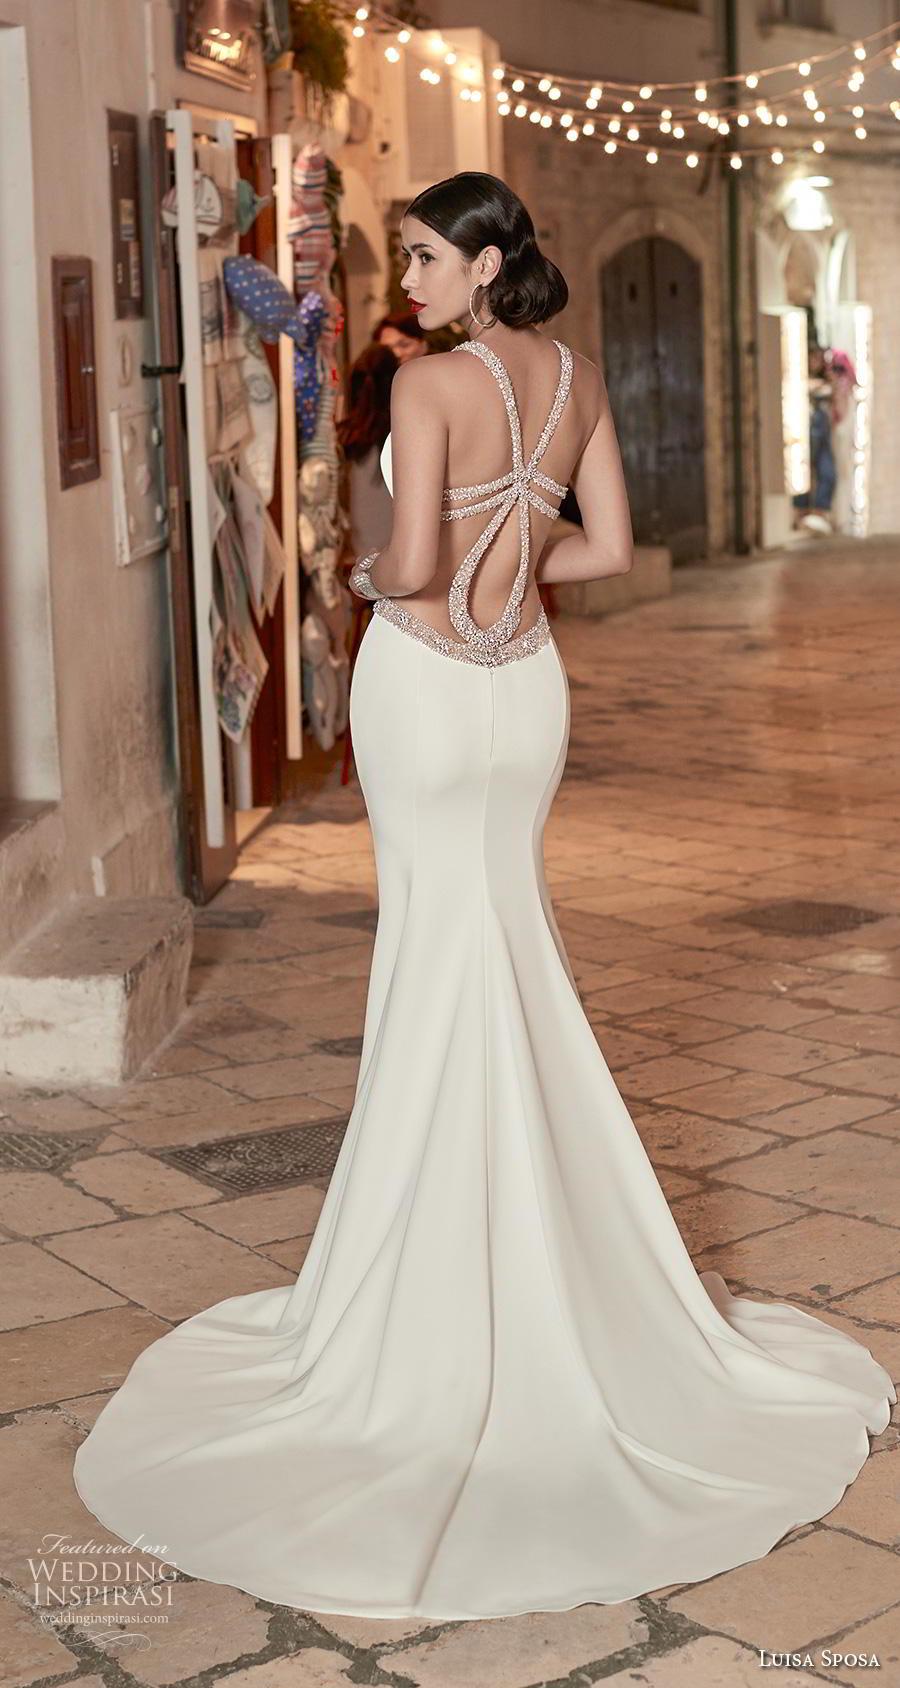 luisa sposa 2020 bridal sleeveless halter neck keyhole bodice cutout side slit skirt simple glamorous sheath wedding dress cross strap back medium train (19) bv